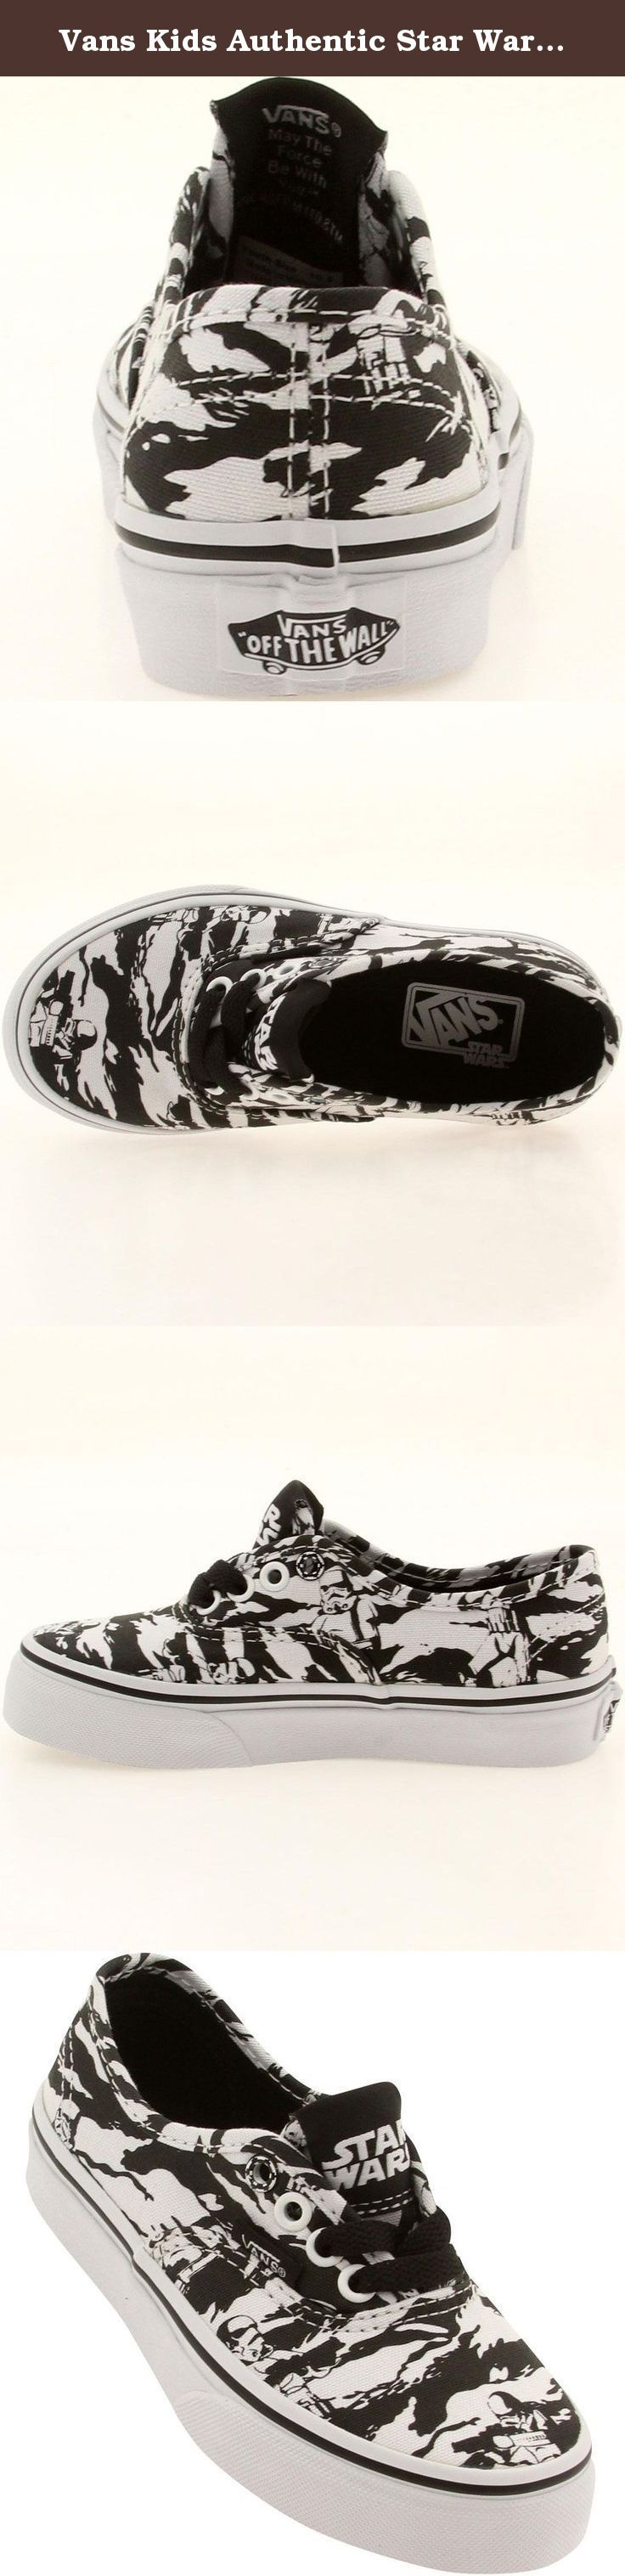 Vans Kids Authentic Star Wars Dark Side Storm Trooper Camo Sneakers Shoes. Vans Kids Authentic Star Wars Dark Side Storm Trooper Camo Sneakers Shoes.